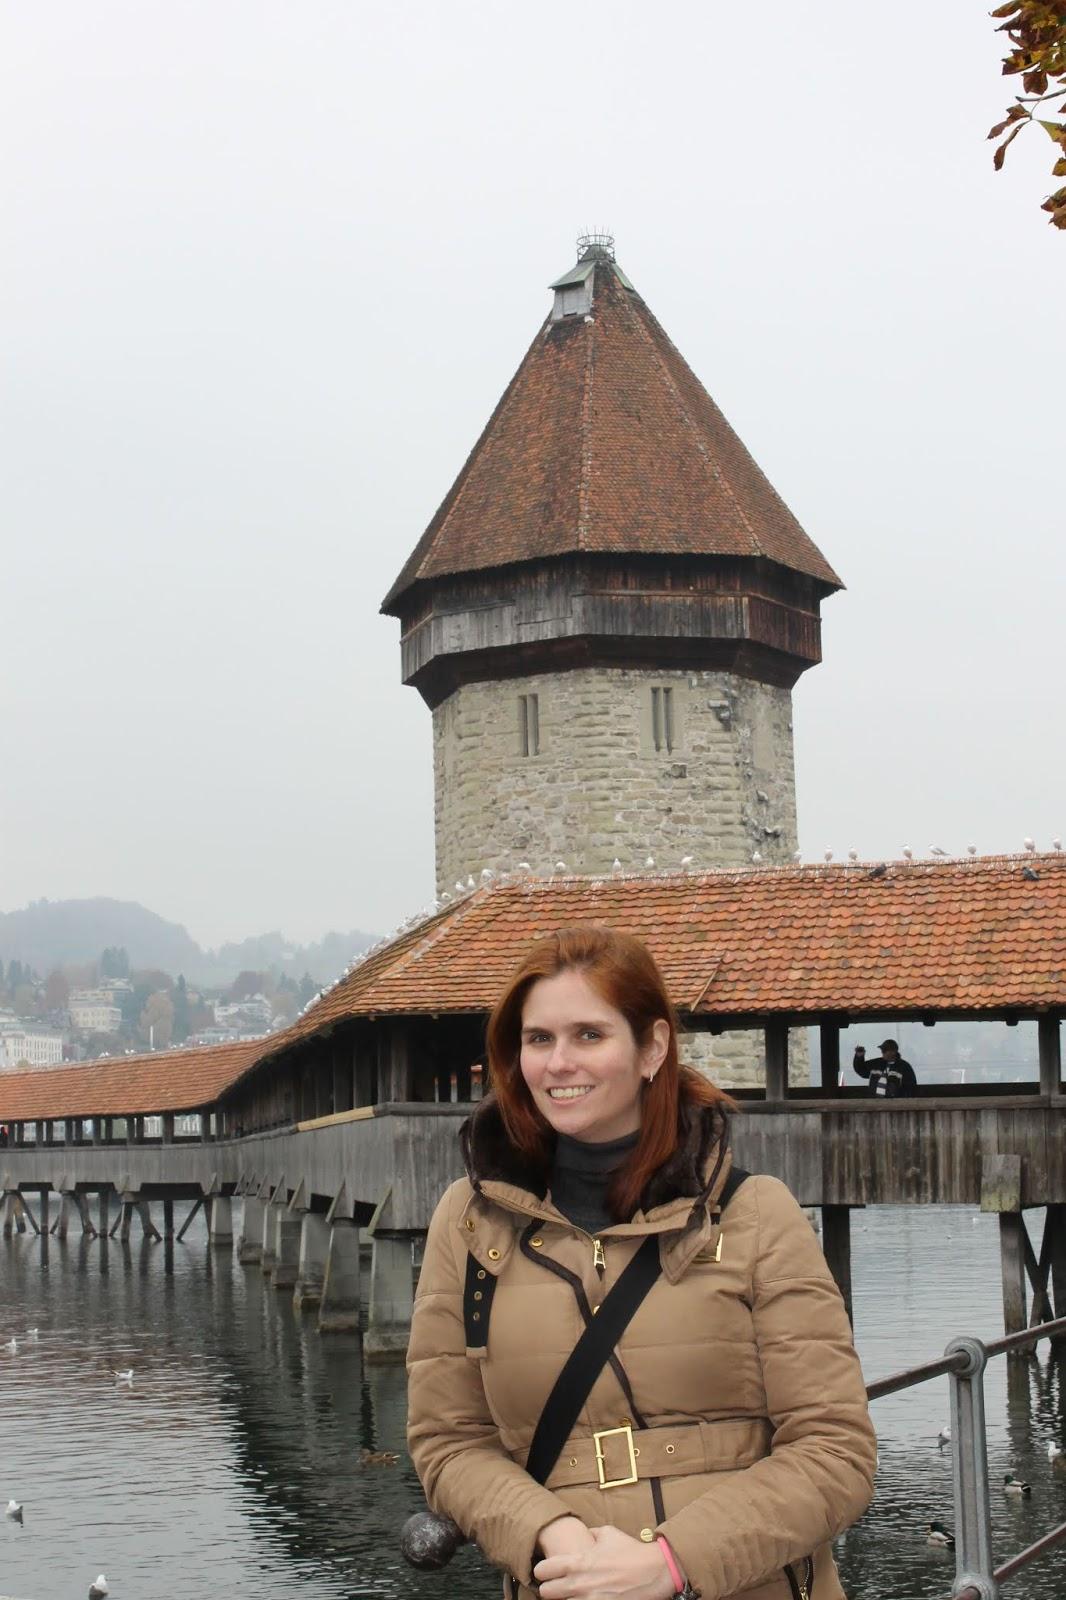 Wasserturm ou Torre de Água - Luzern